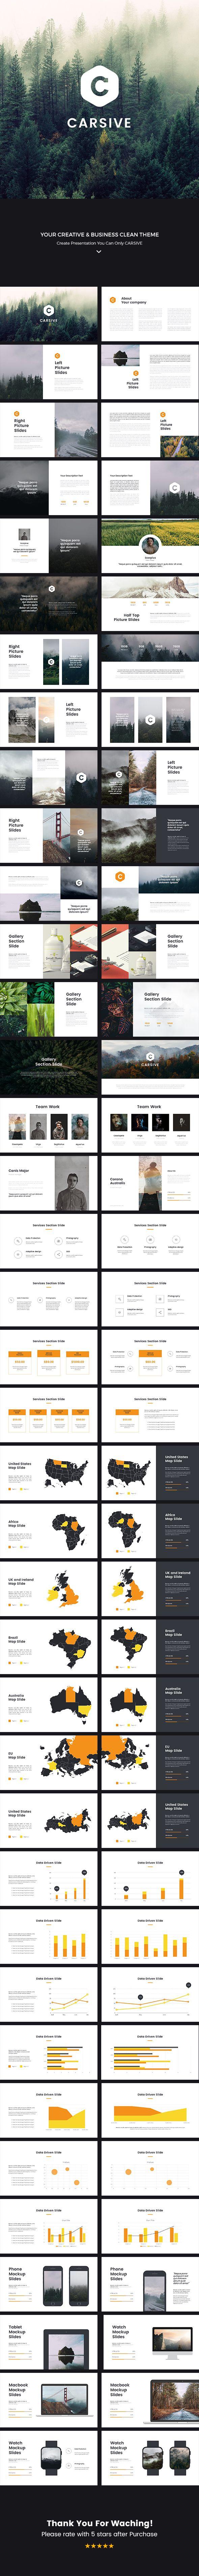 Carsive Clean Keynote Template — Keynote KEY #hd #shape • Download ➝ https://graphicriver.net/item/carsive-clean-keynote-template/19128521?ref=pxcr